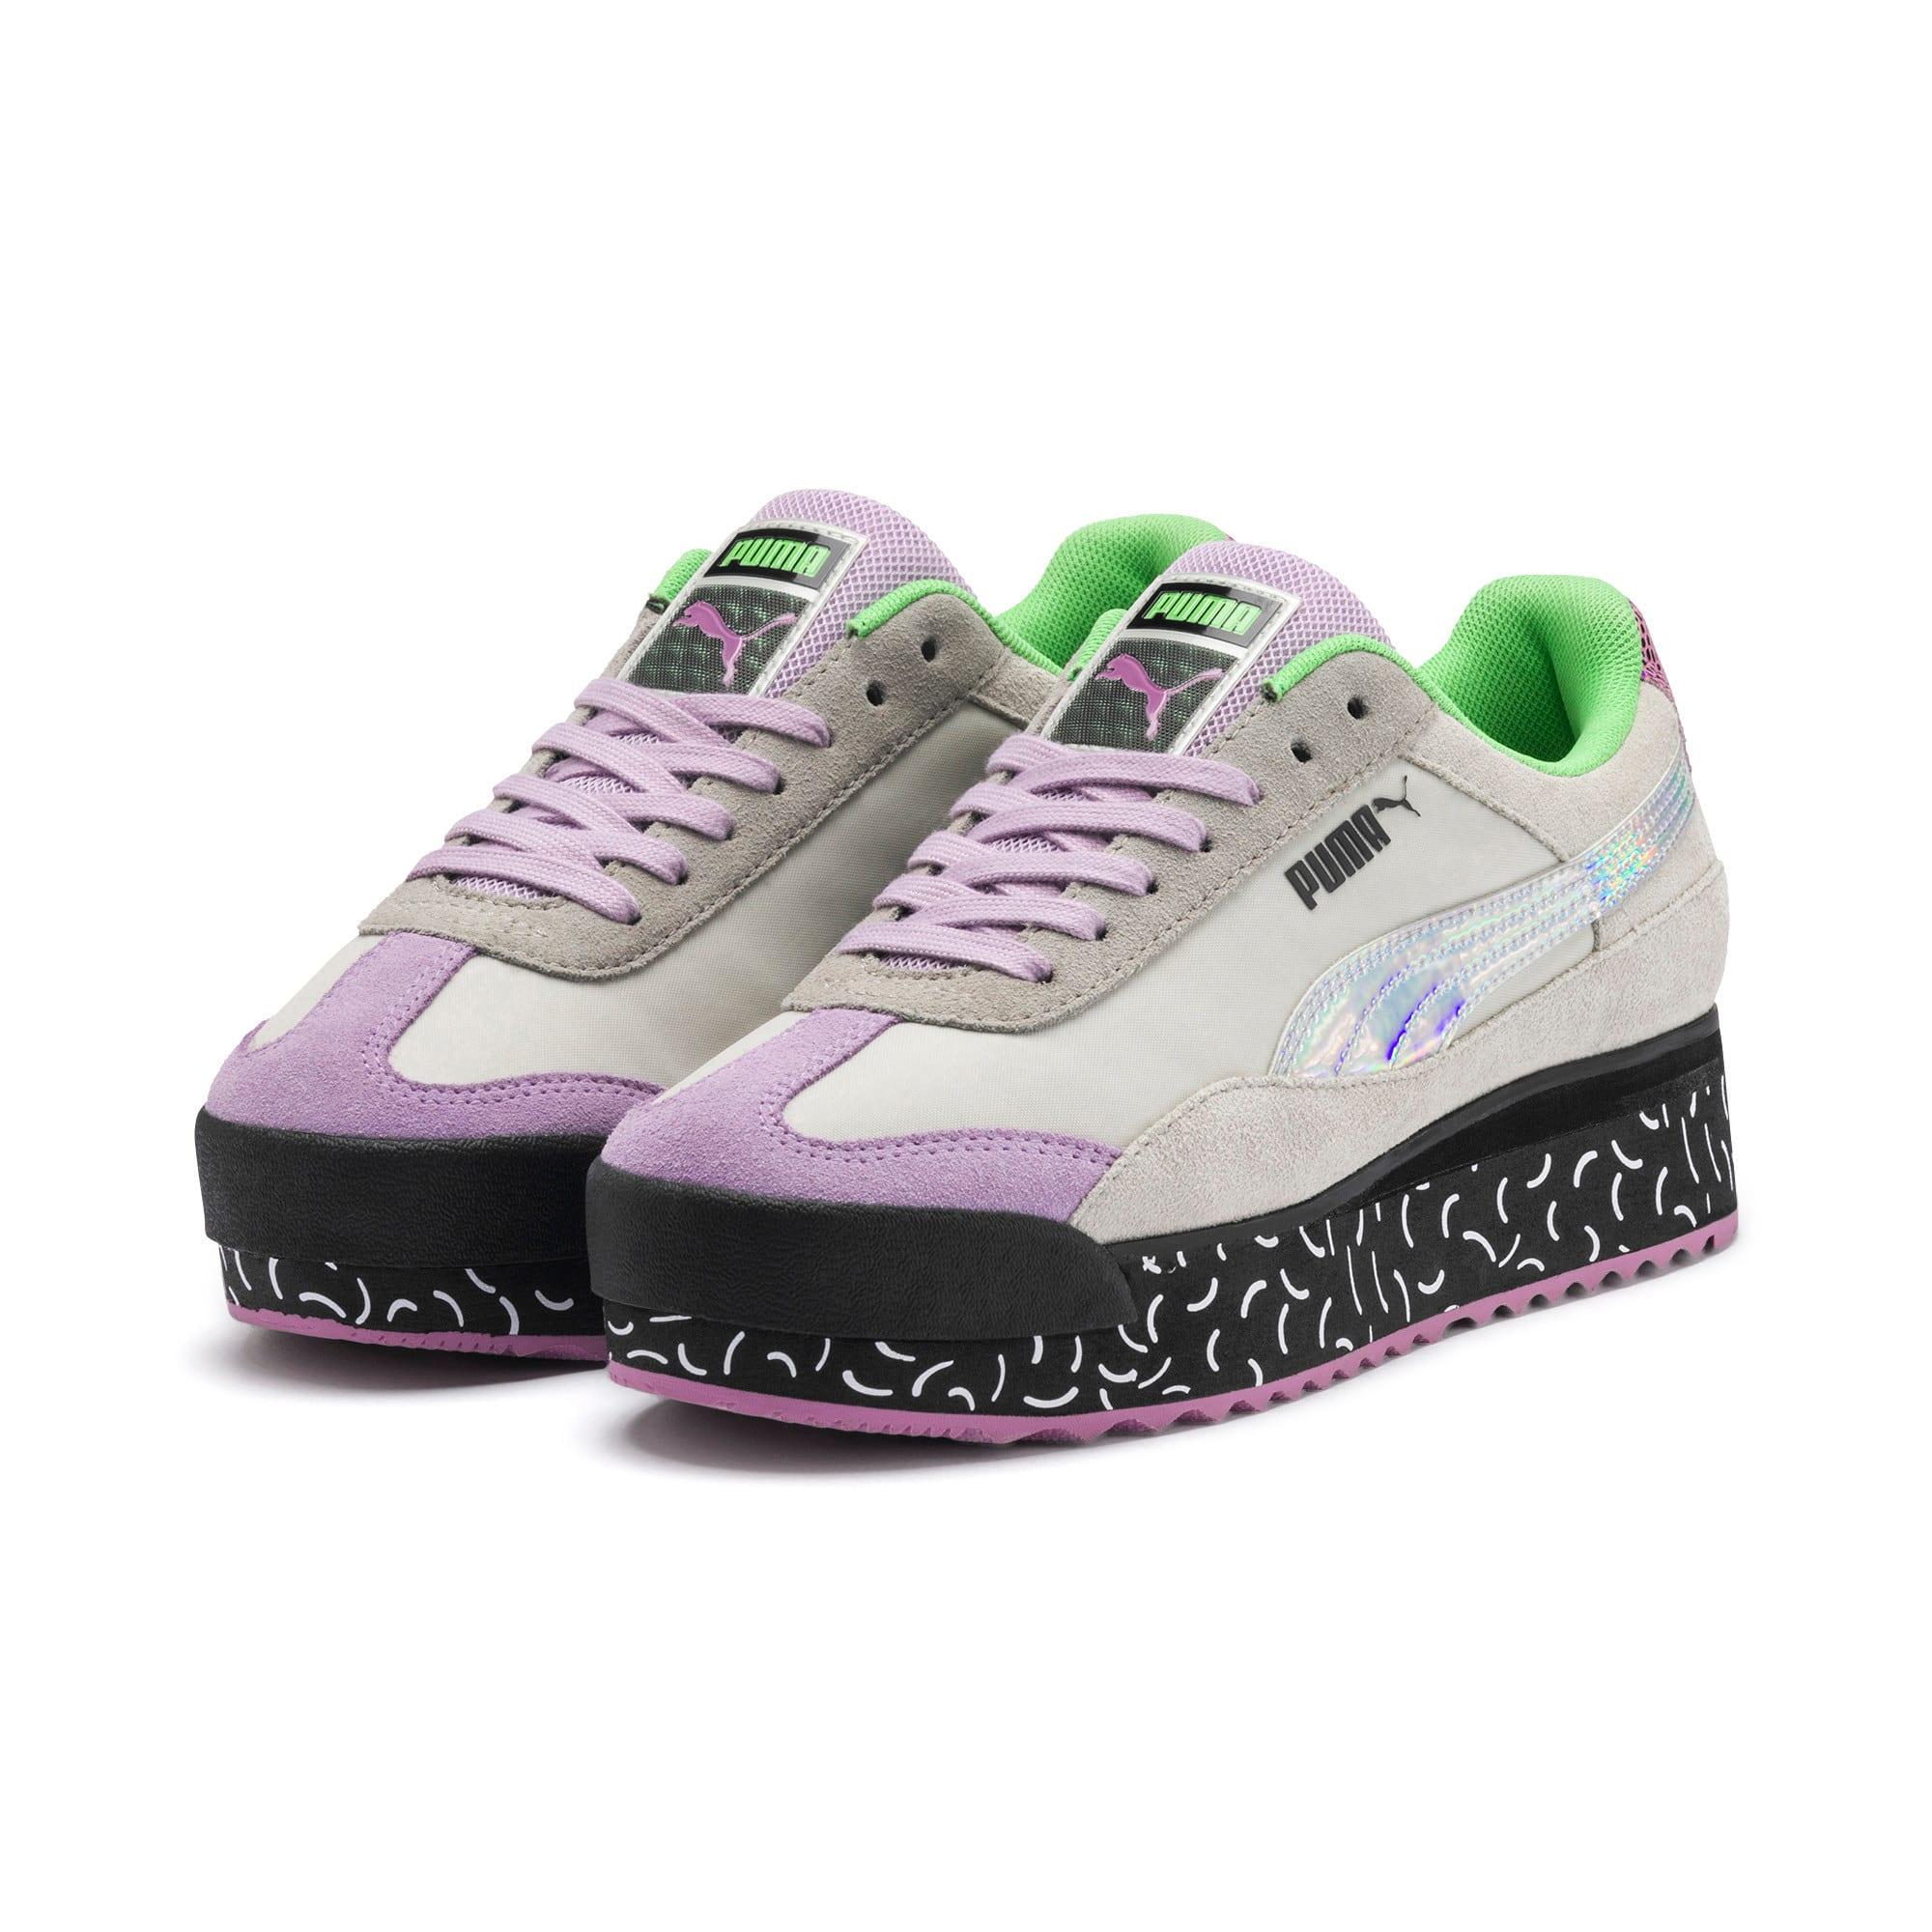 Thumbnail 2 of Roma Amor Dimension Women's Sneakers, Agate Gray-Smoky Grape, medium